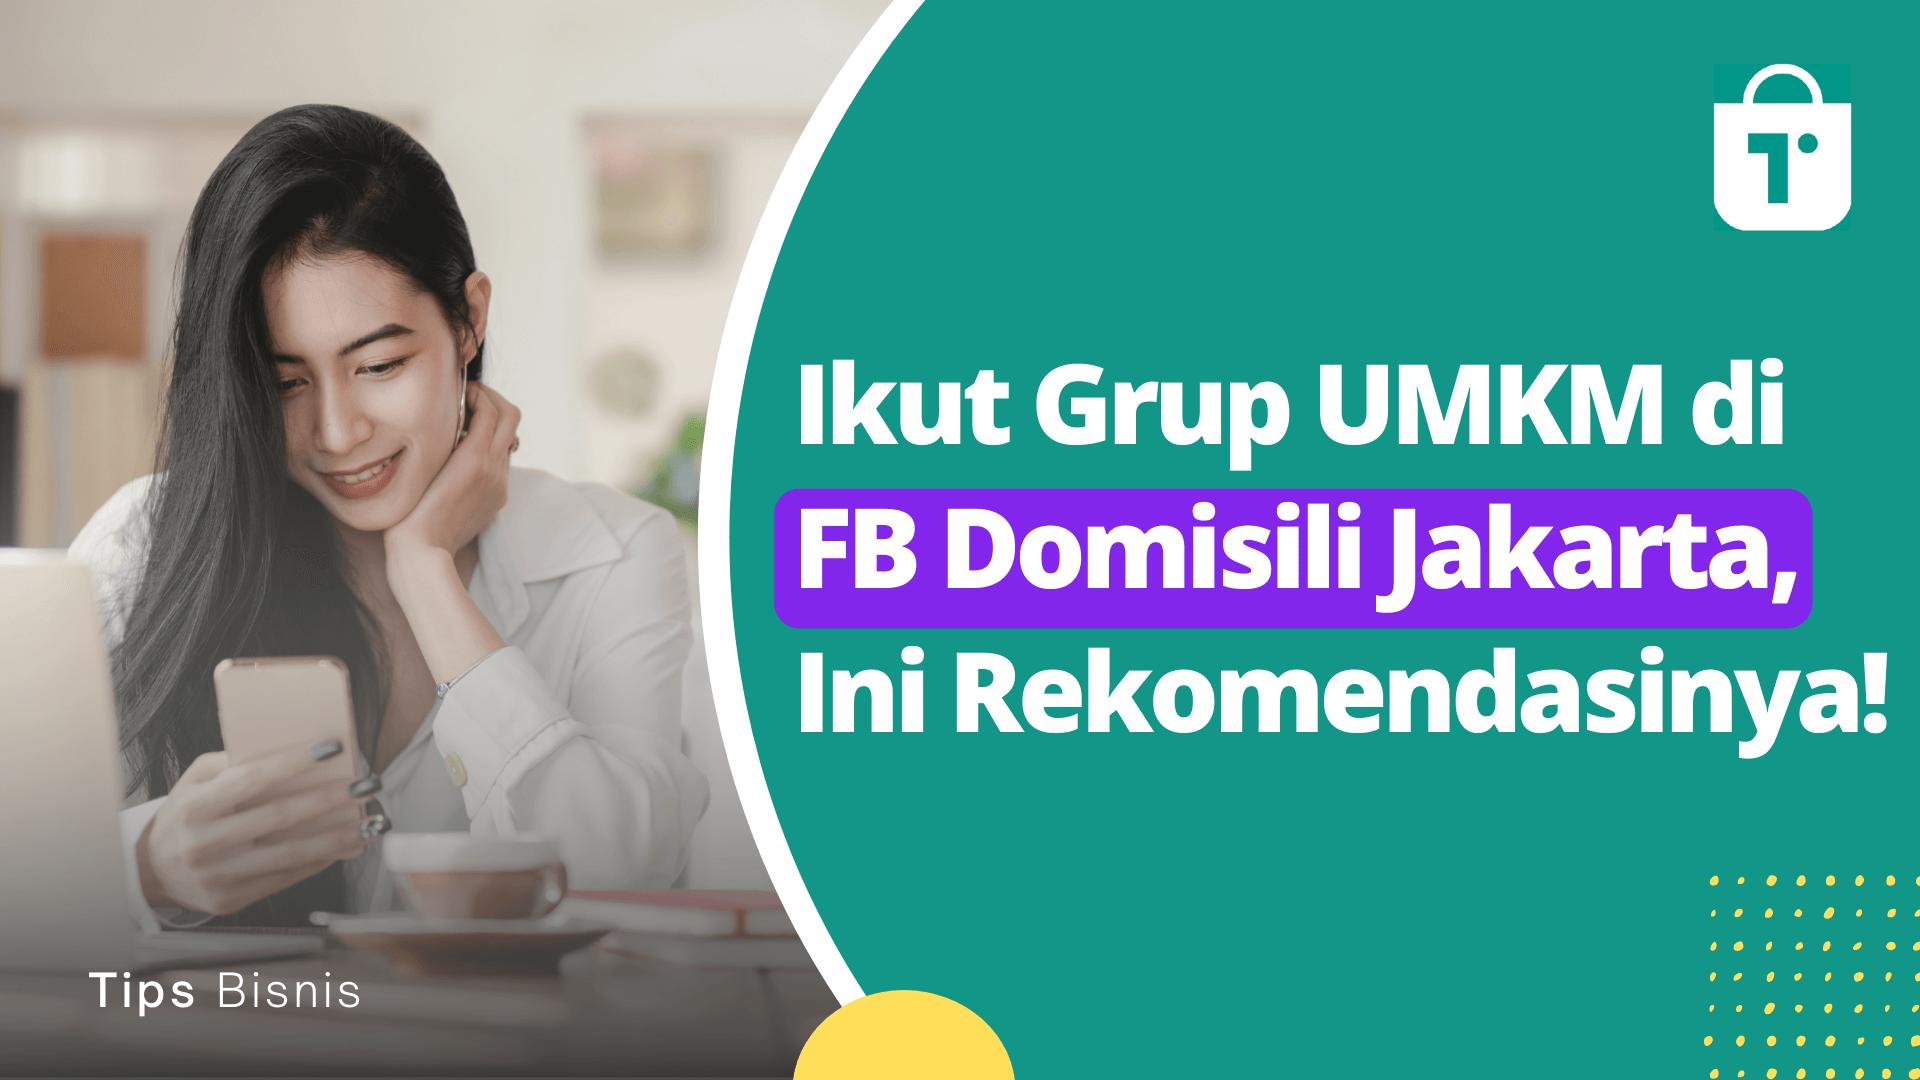 Rekomendasi 8 Grup Bisnis UMKM di Facebook (Domisili Jakarta)